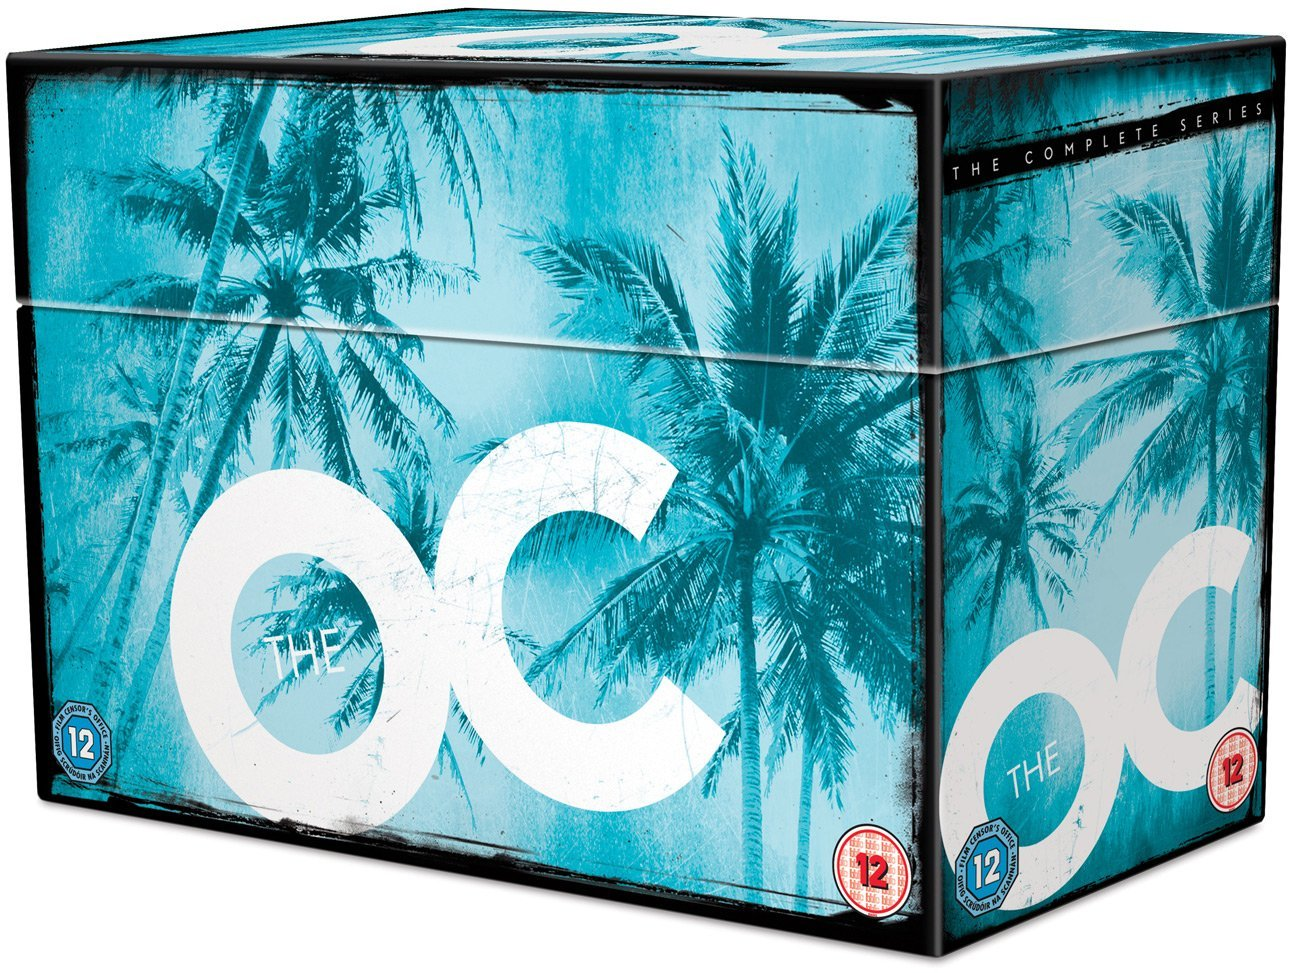 The O.C. - Complete Season 1-4 (DVD)